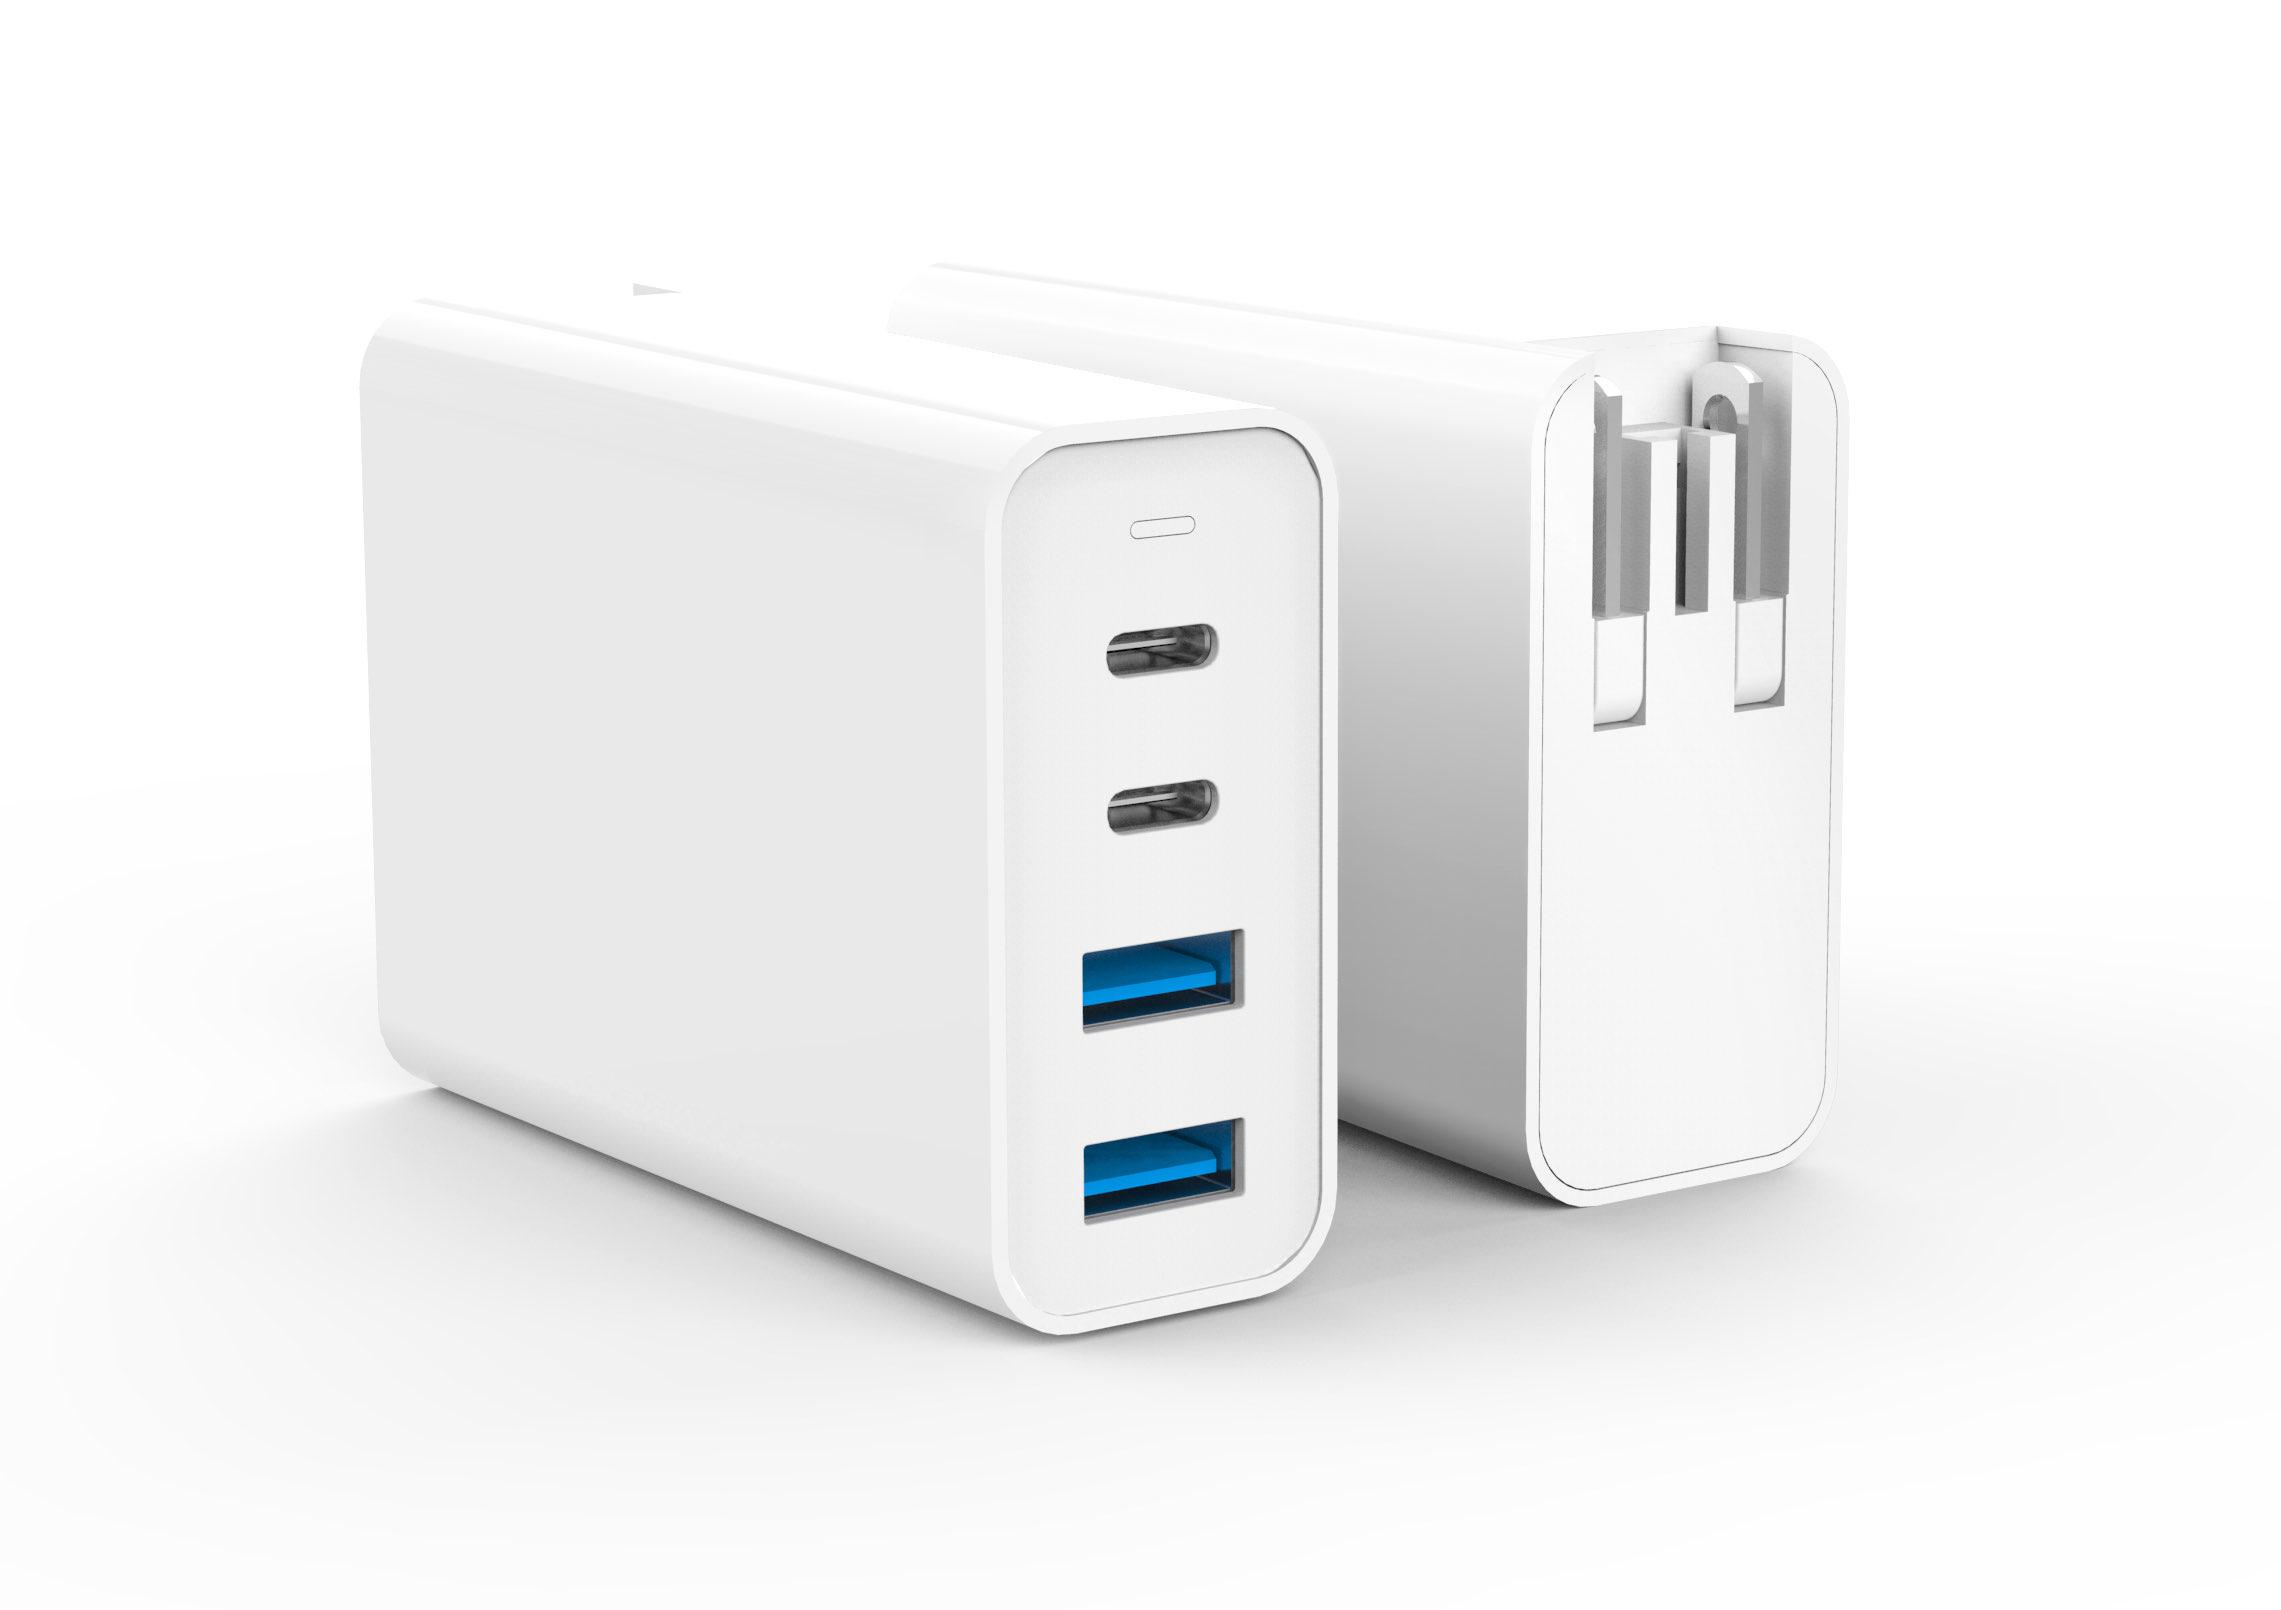 【USB PD対応】あのHYPER JUICEが世界初のGaN 100W USB充電器を制作へ、IndieGoGoでも出資募集中